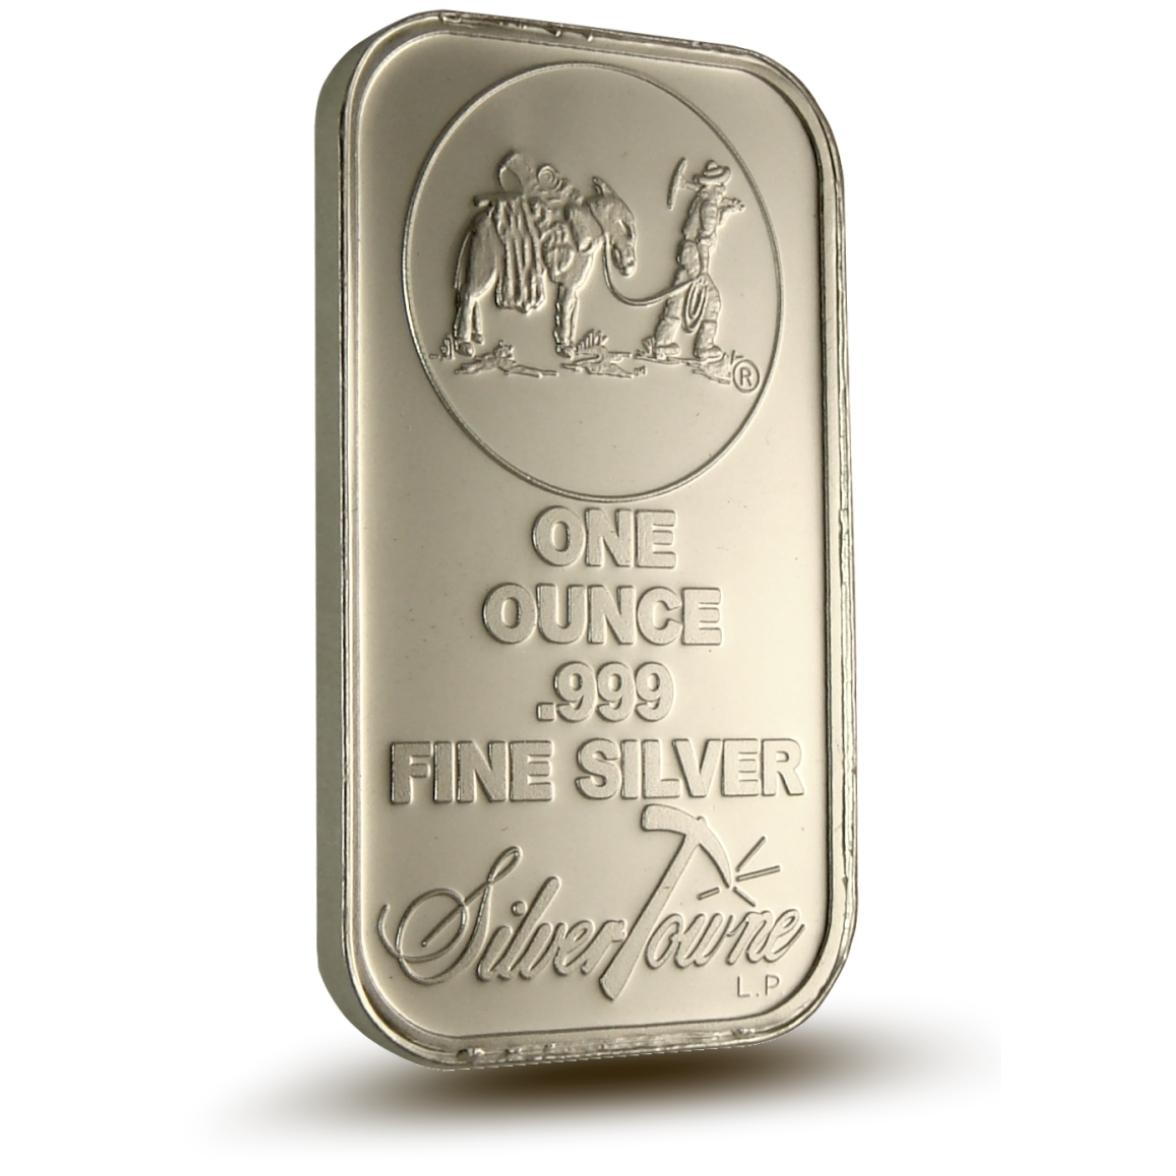 Silvertowne 1 oz .999 Fine Silver Bar Front